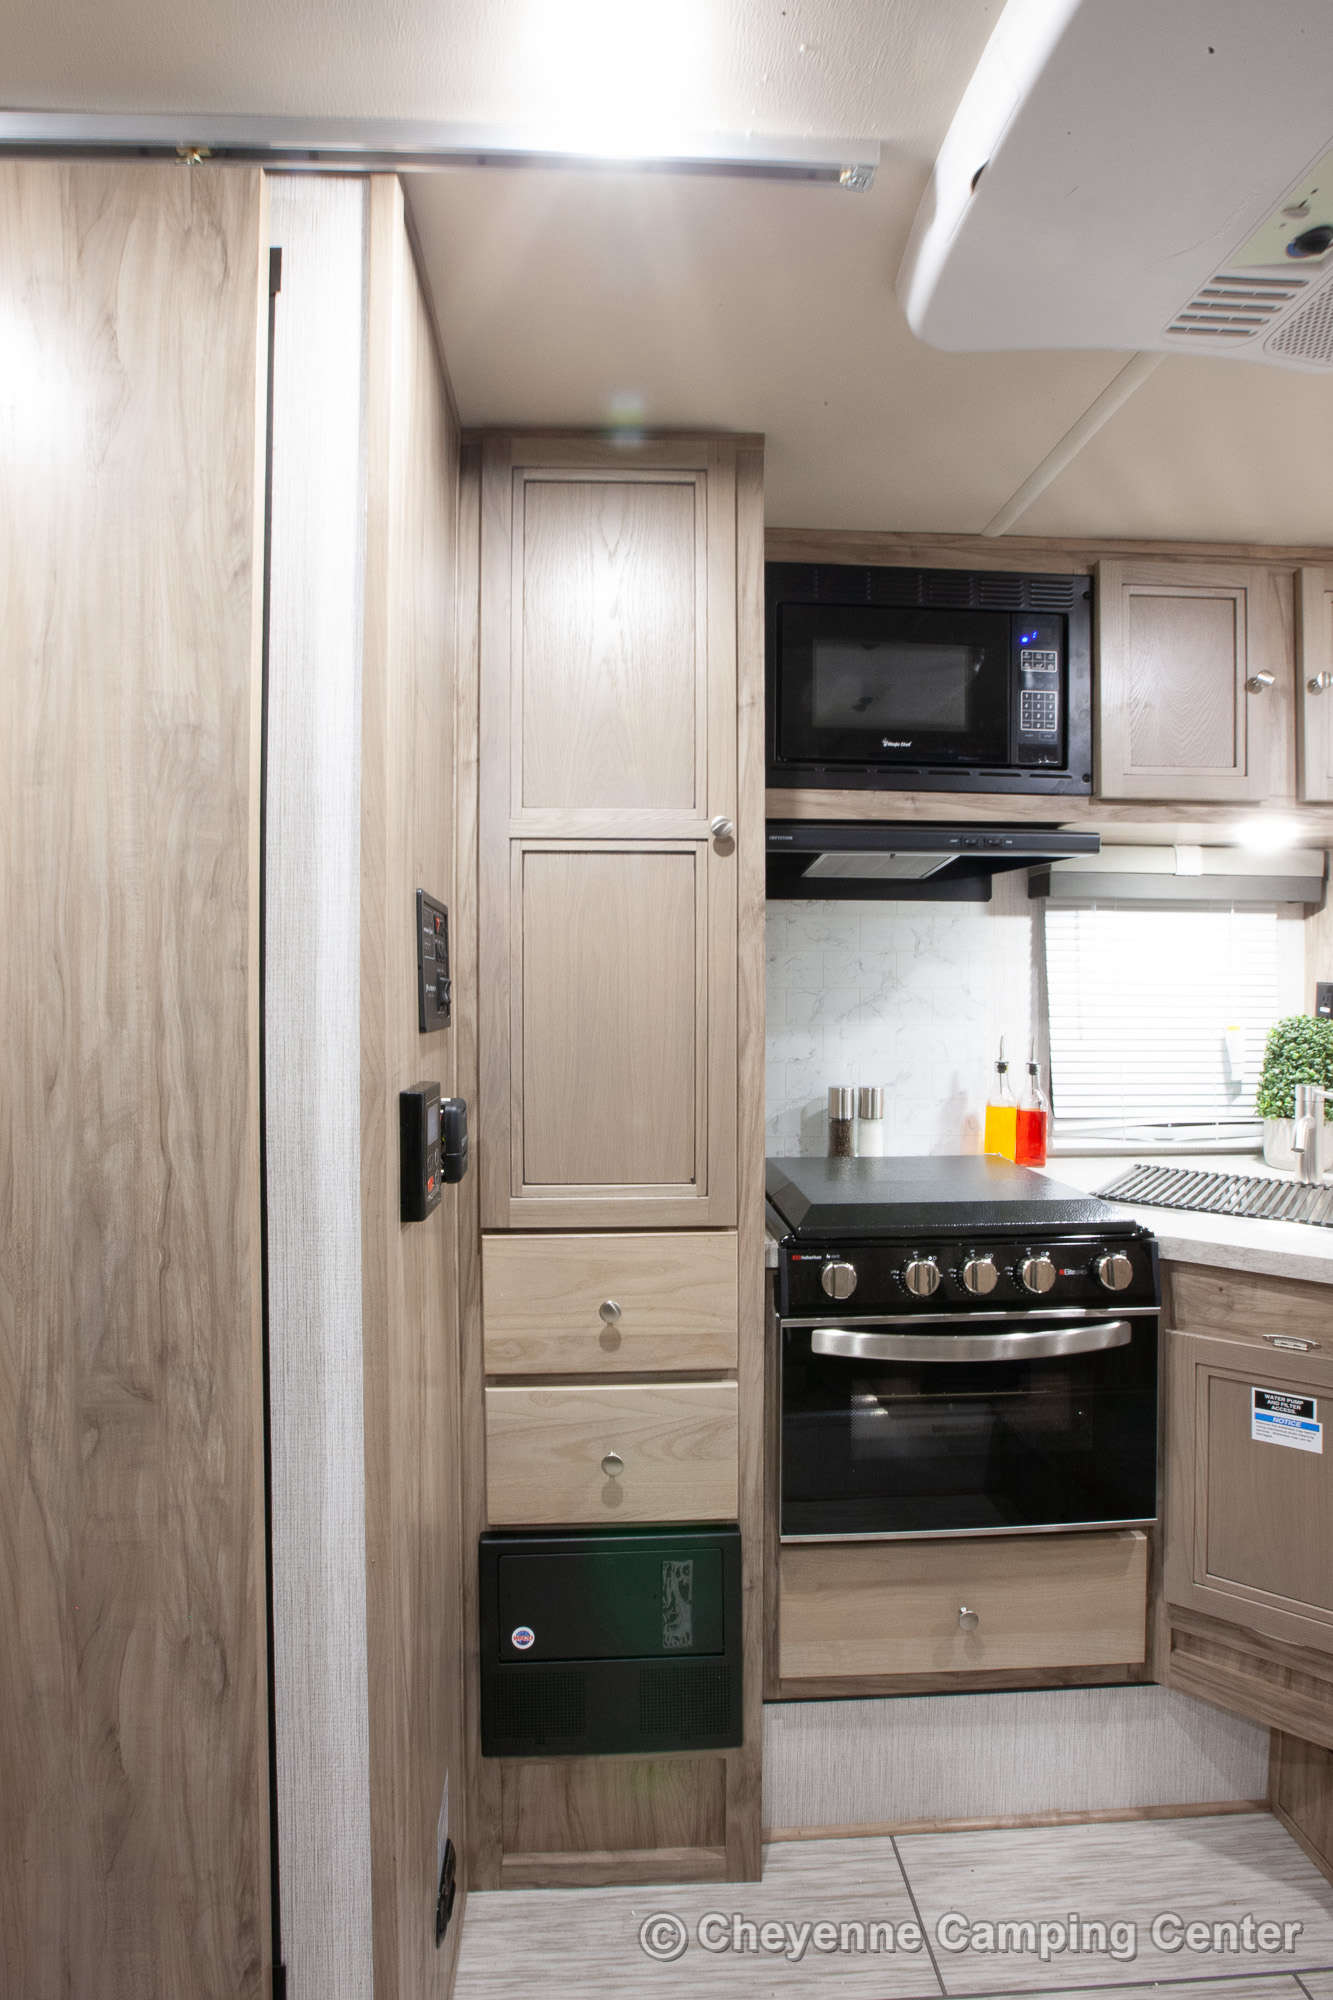 2021 Palomino BackPack HS-2902 Truck Camper Interior Image